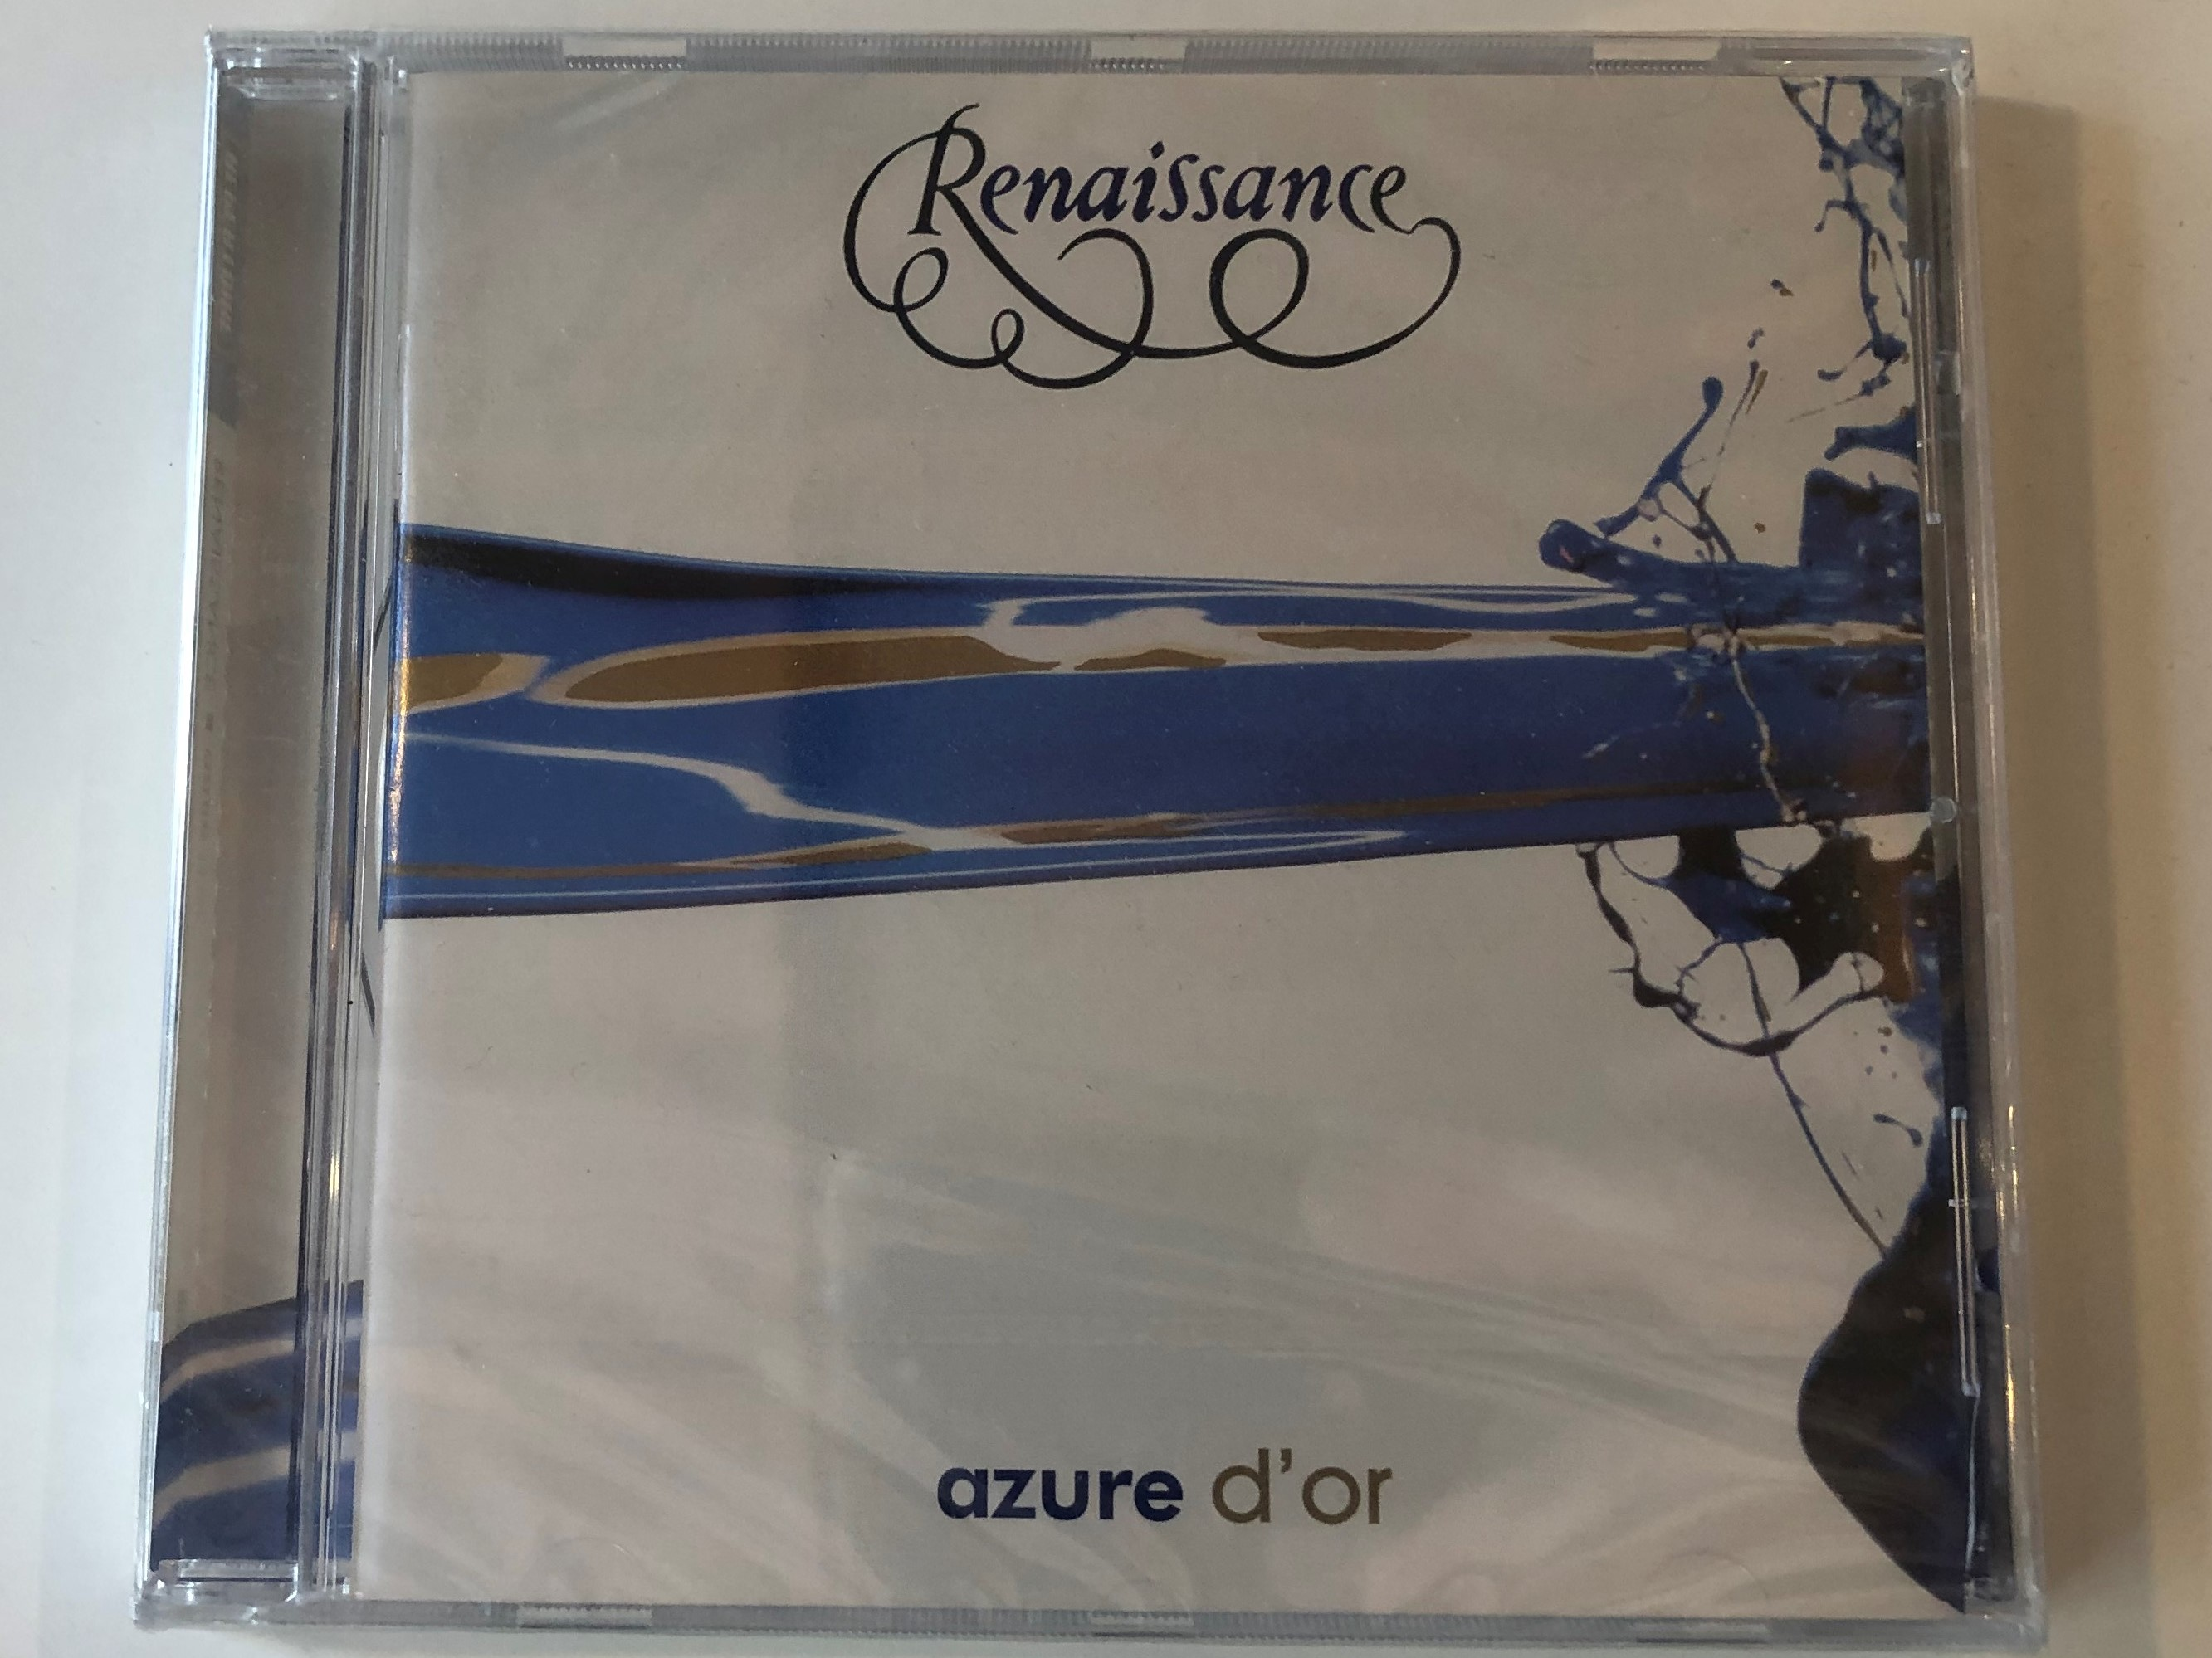 renaissance-azure-d-or-repertoire-records-audio-cd-2011-repuk-1161-1-.jpg